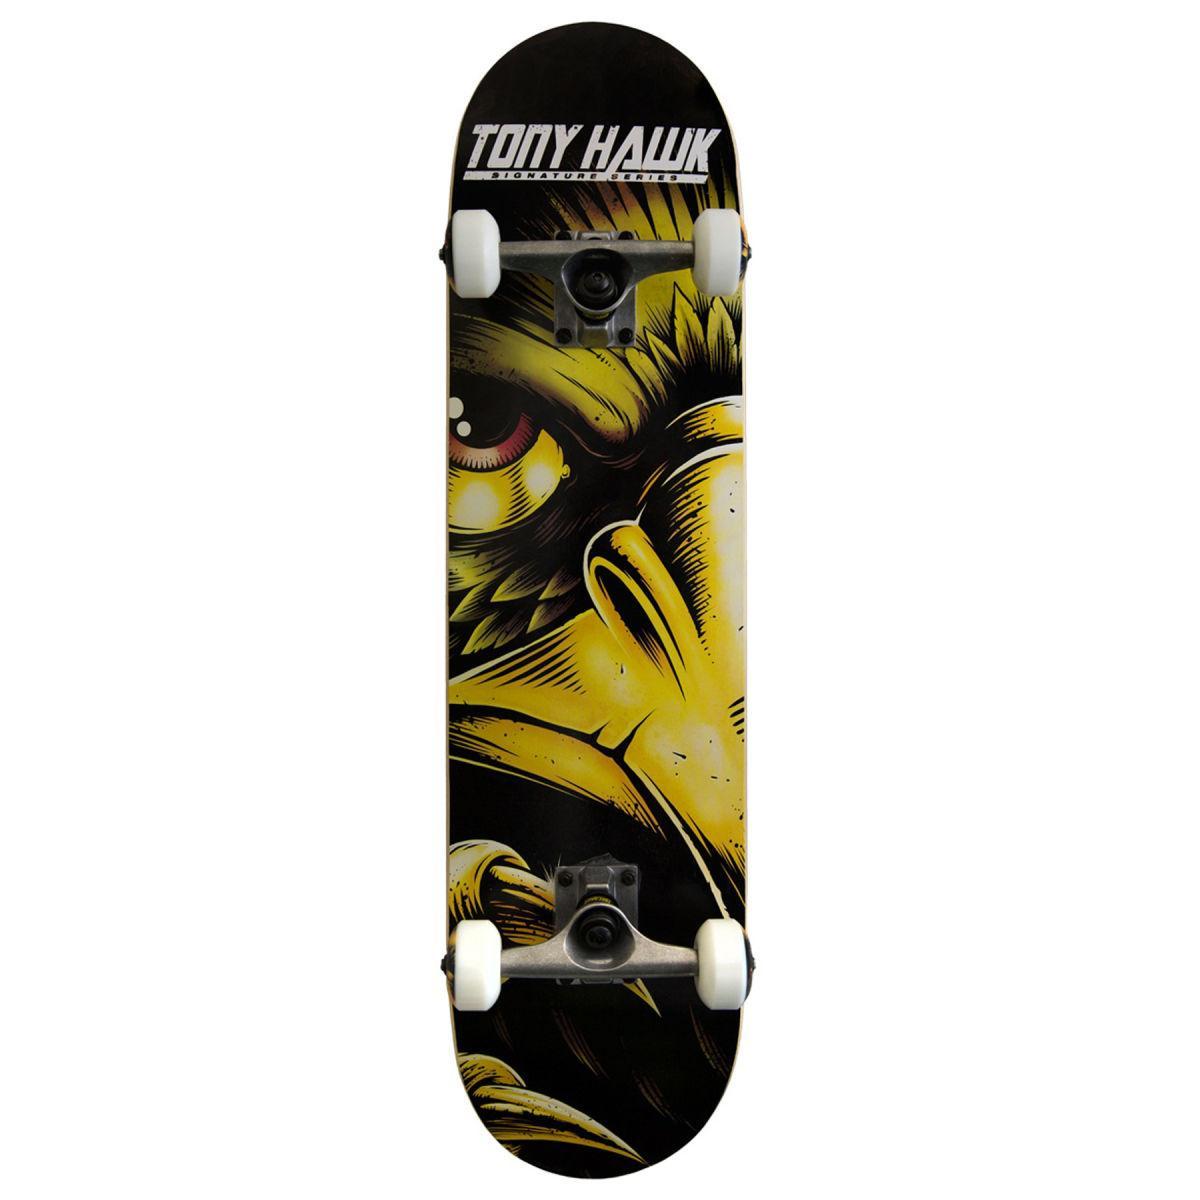 Sélection de Skateboards en promotion - Ex : Tony Hawk Evil Eye Gold